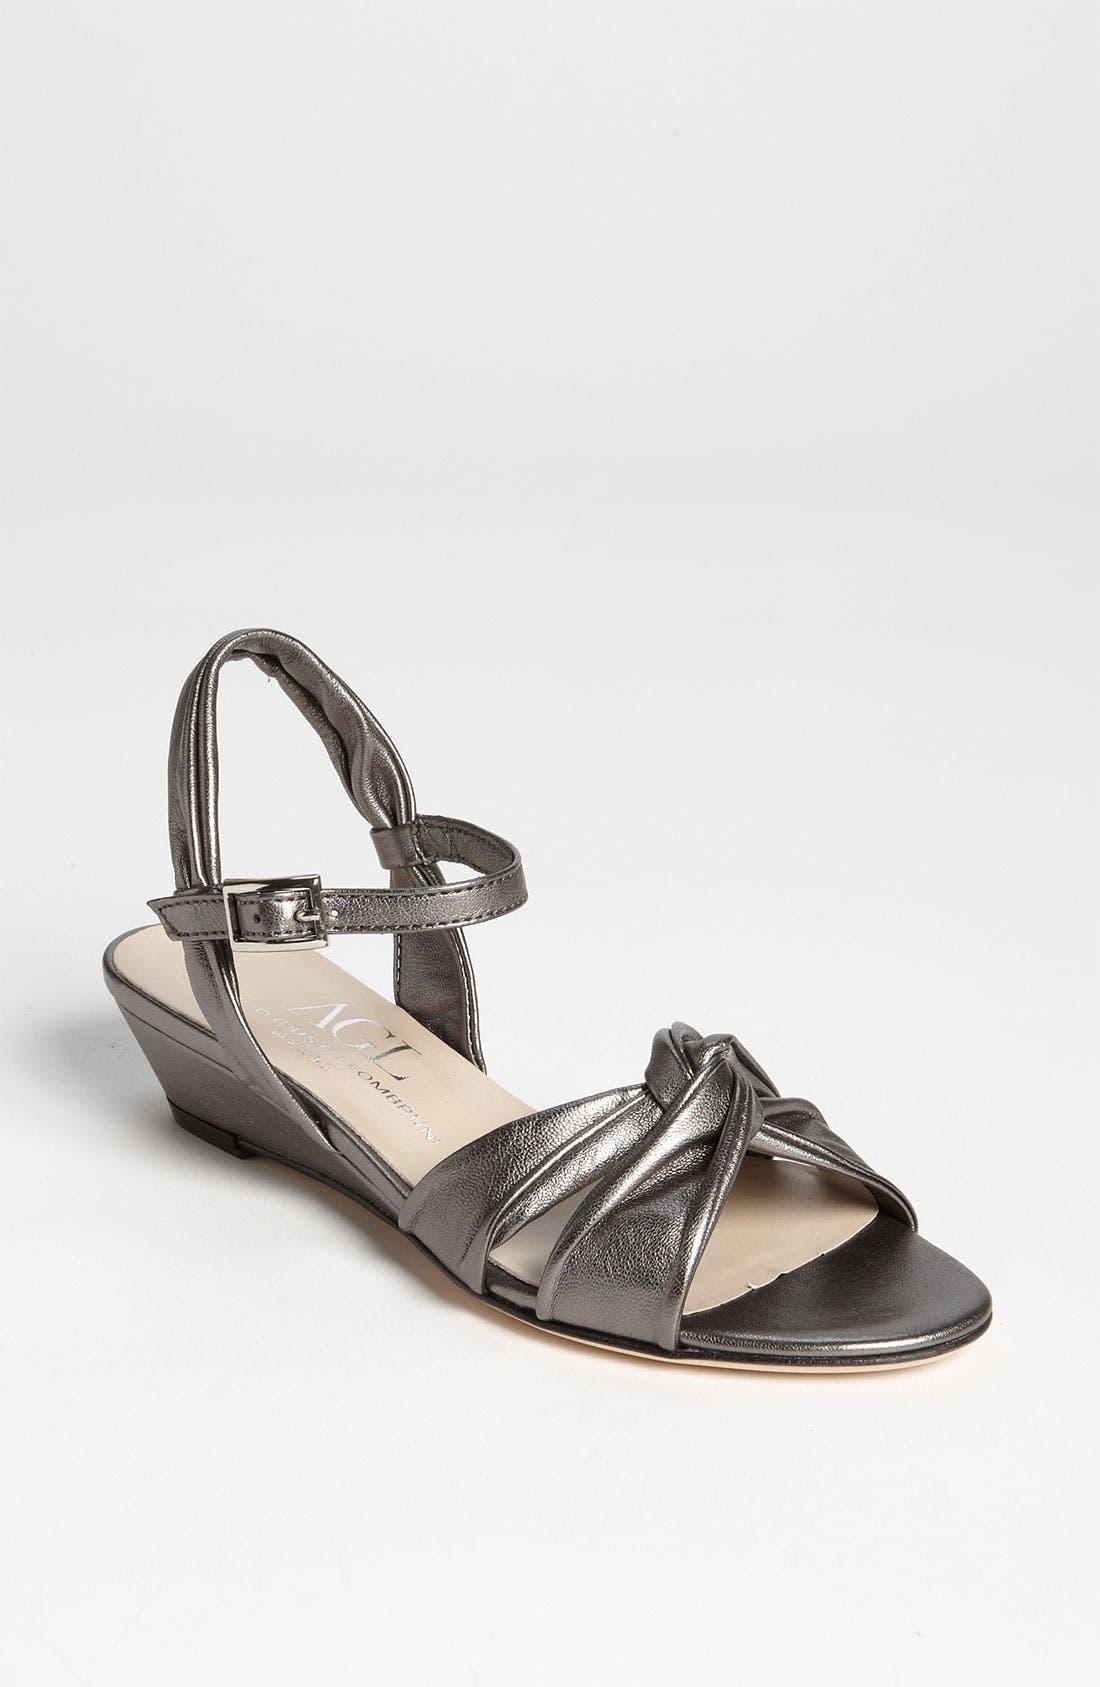 Main Image - Attilio Giusti Leombruni Mini Wedge Sandal